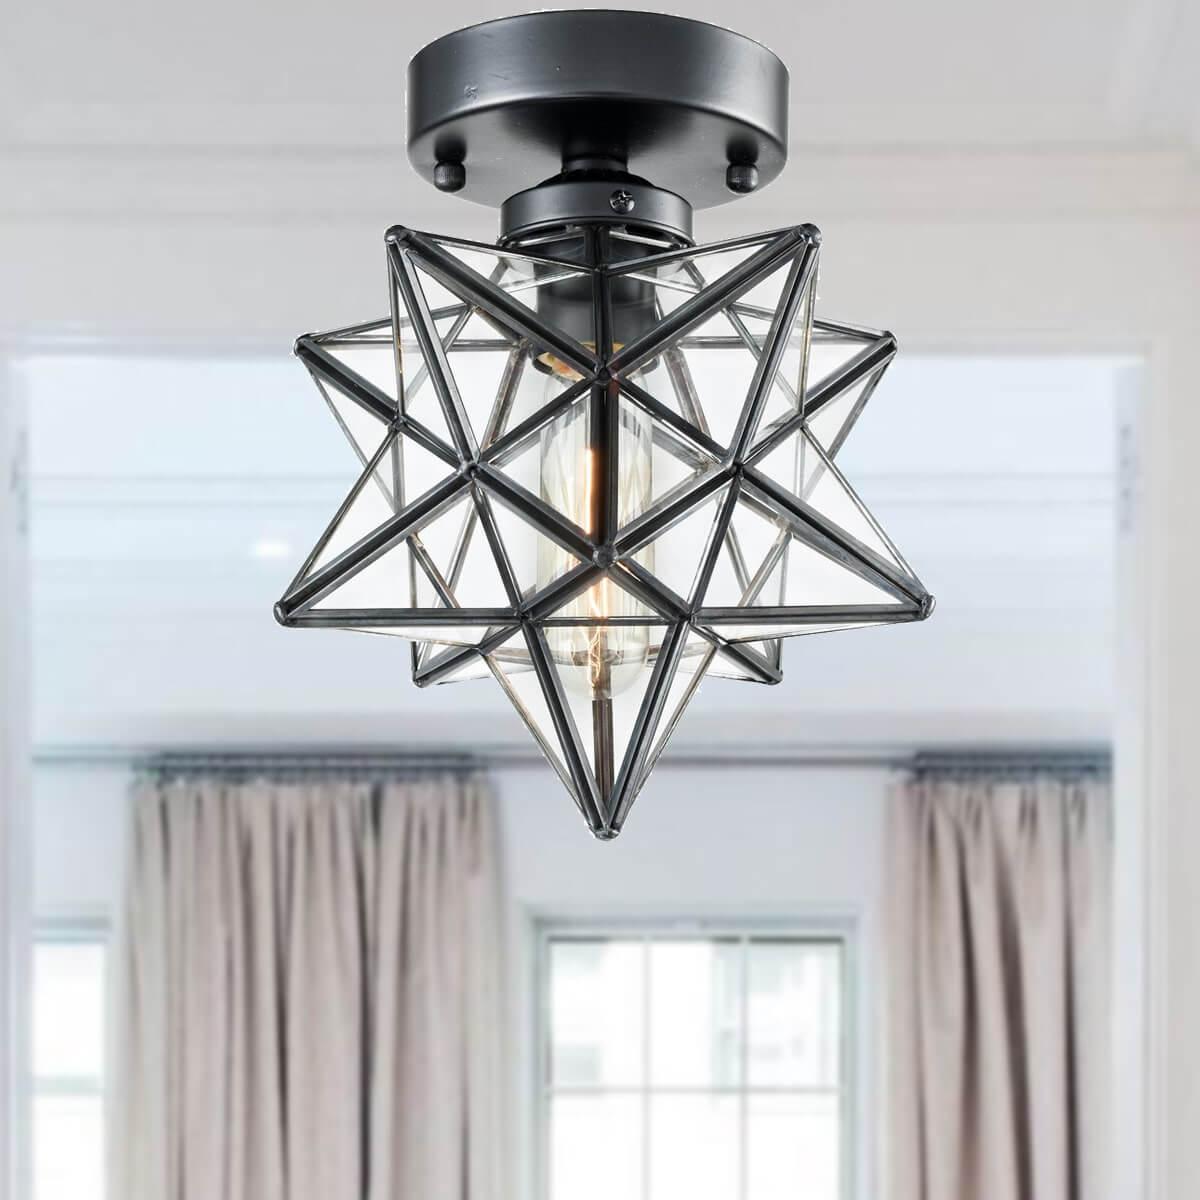 Industrial Moravian Star Ceiling Light Fixture Glass Ceiling Lights